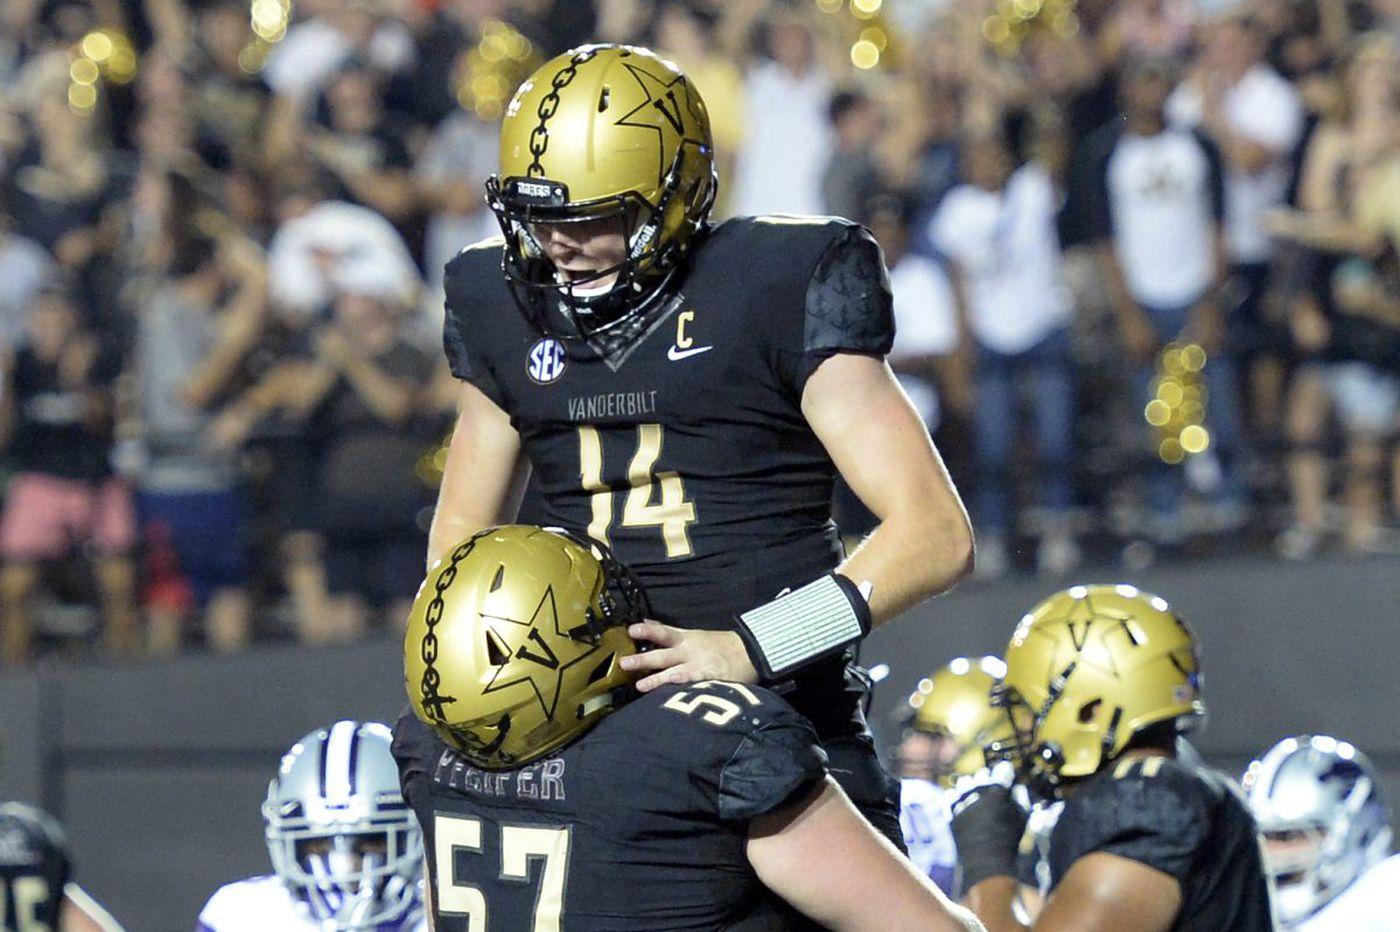 College football watch: Vanderbilt seeking upset of No. 1 Alabama